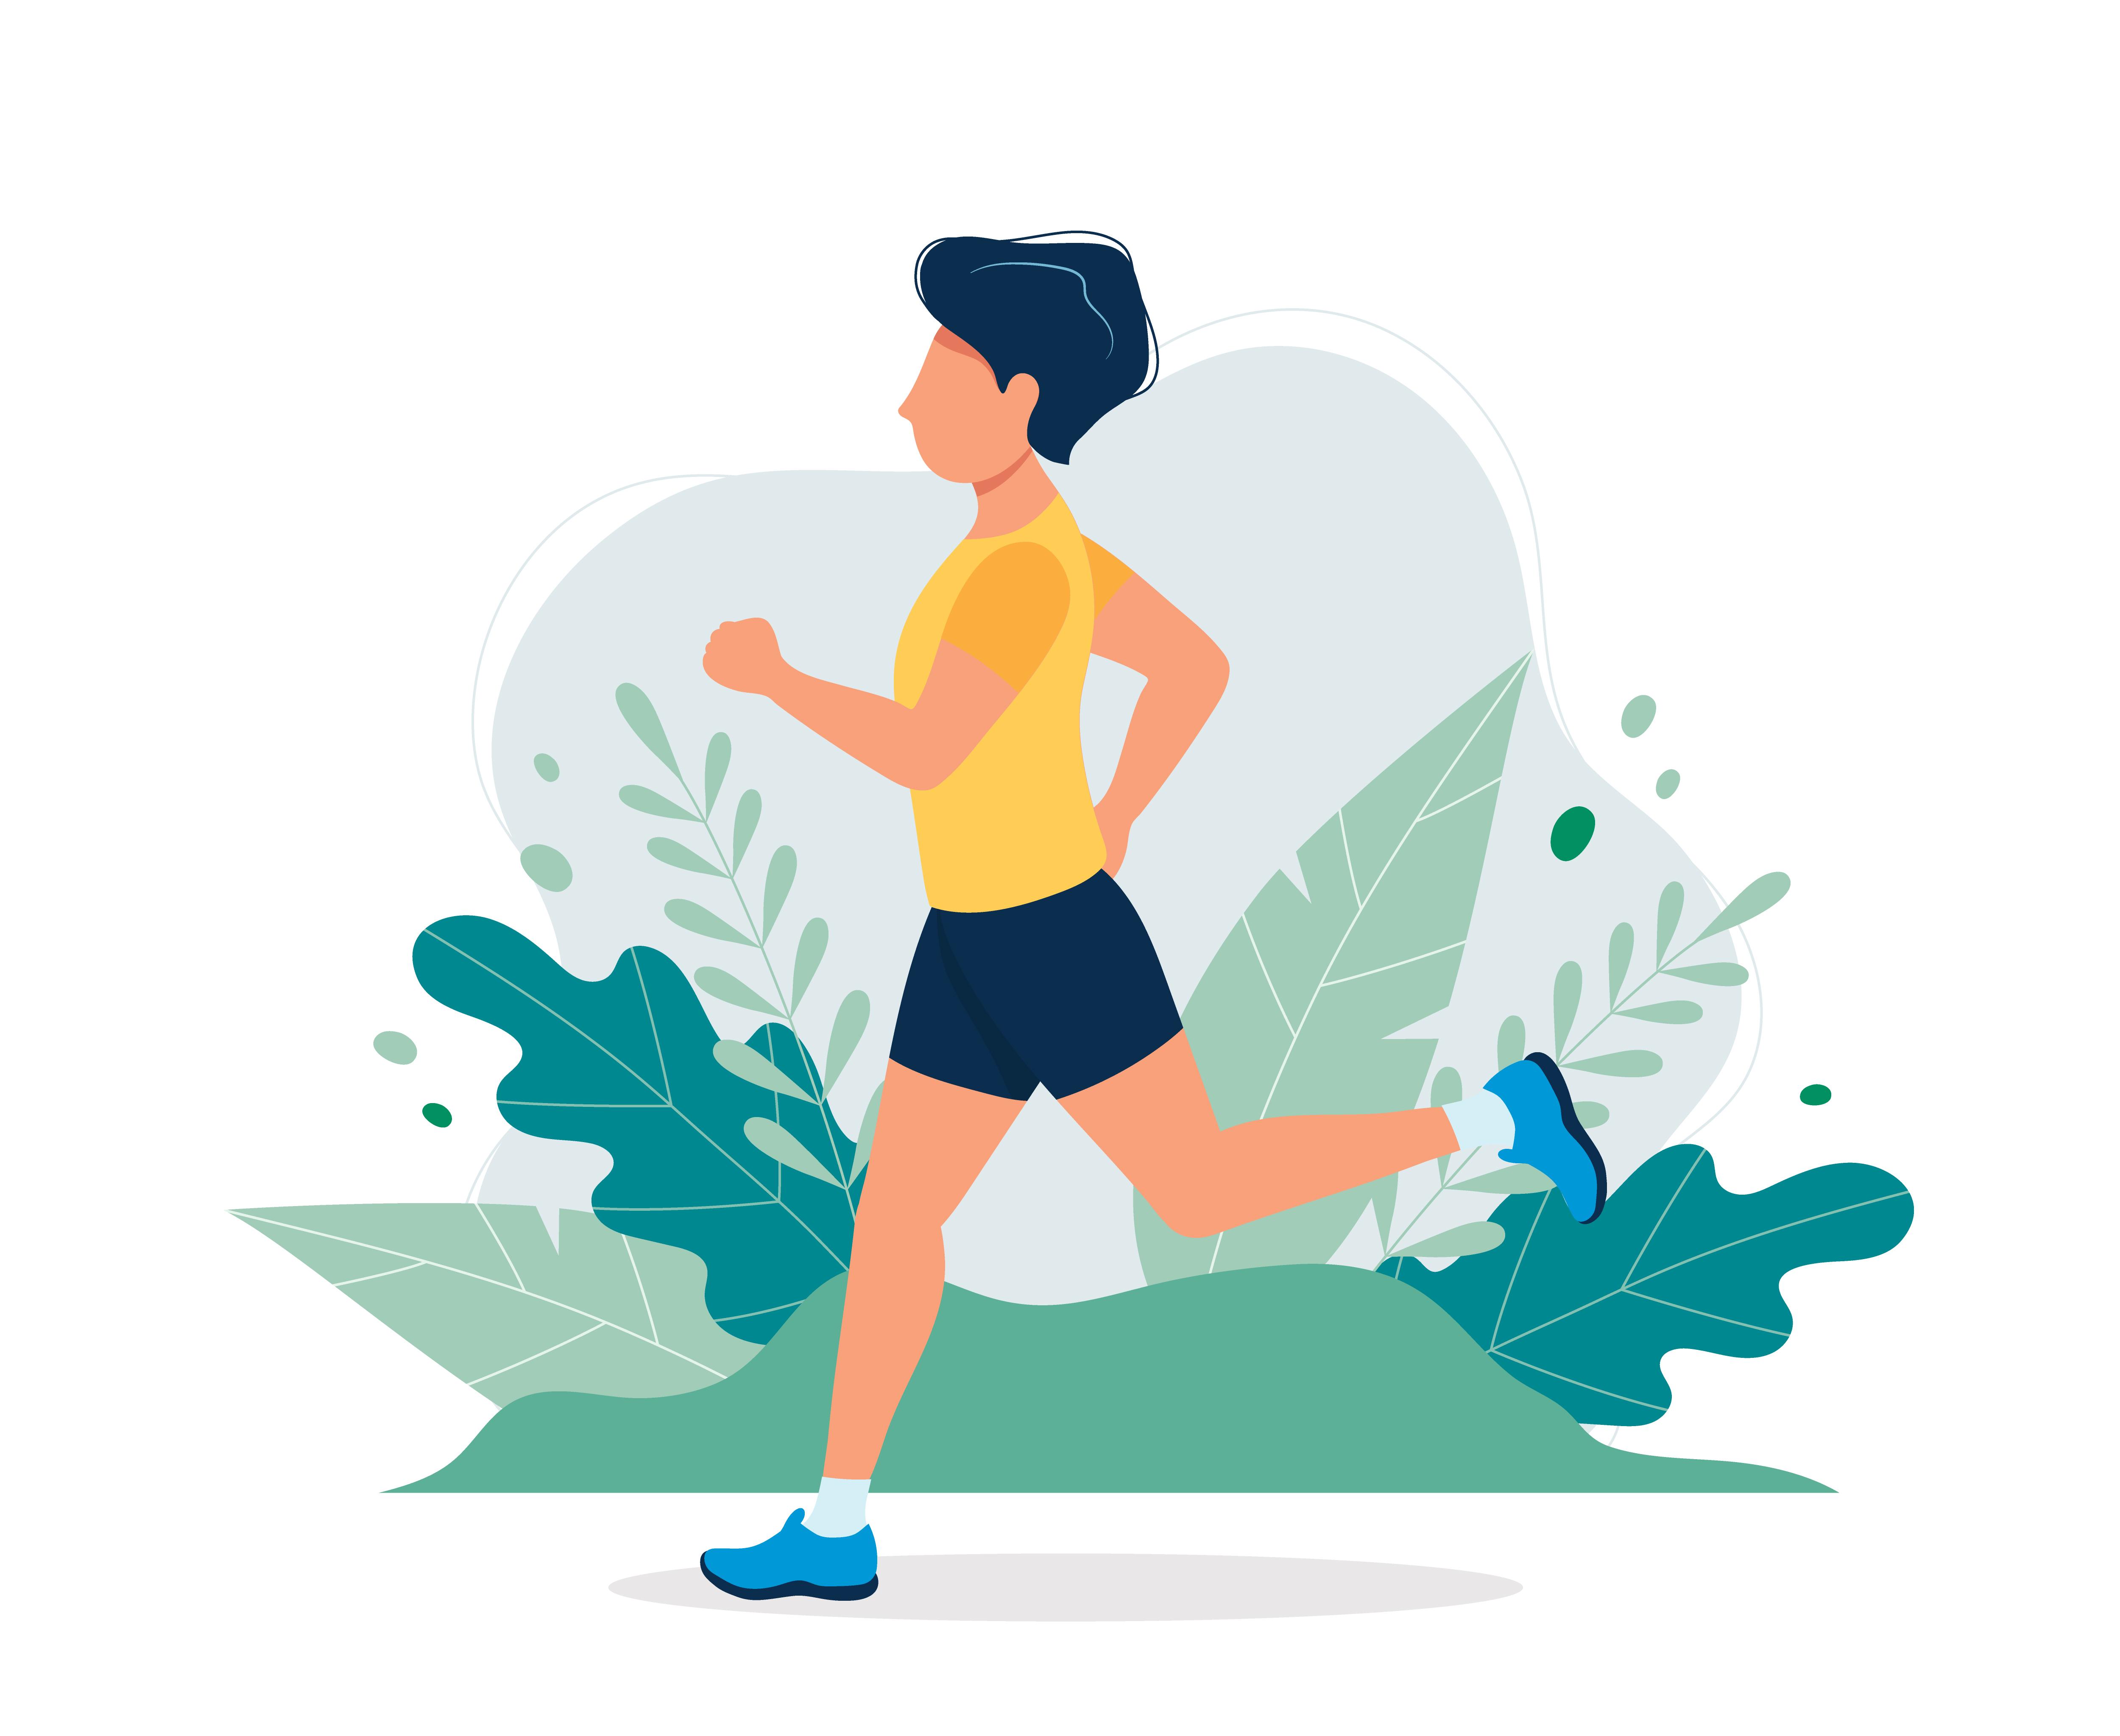 Happy Man Running In The Park Vector Illustration In Flat